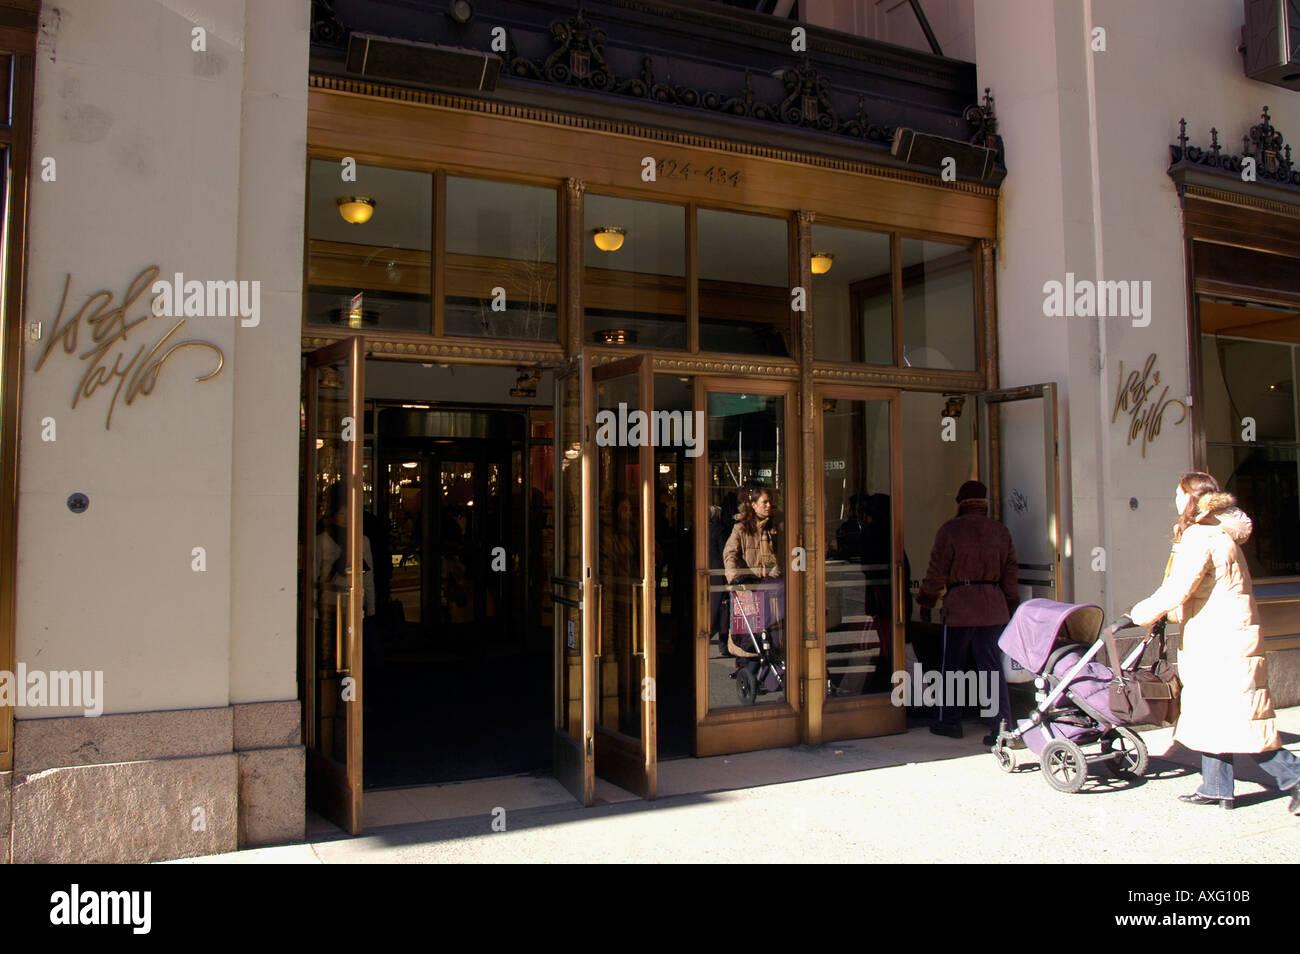 Bloomingdale Store Stock Photos & Bloomingdale Store Stock Images ...